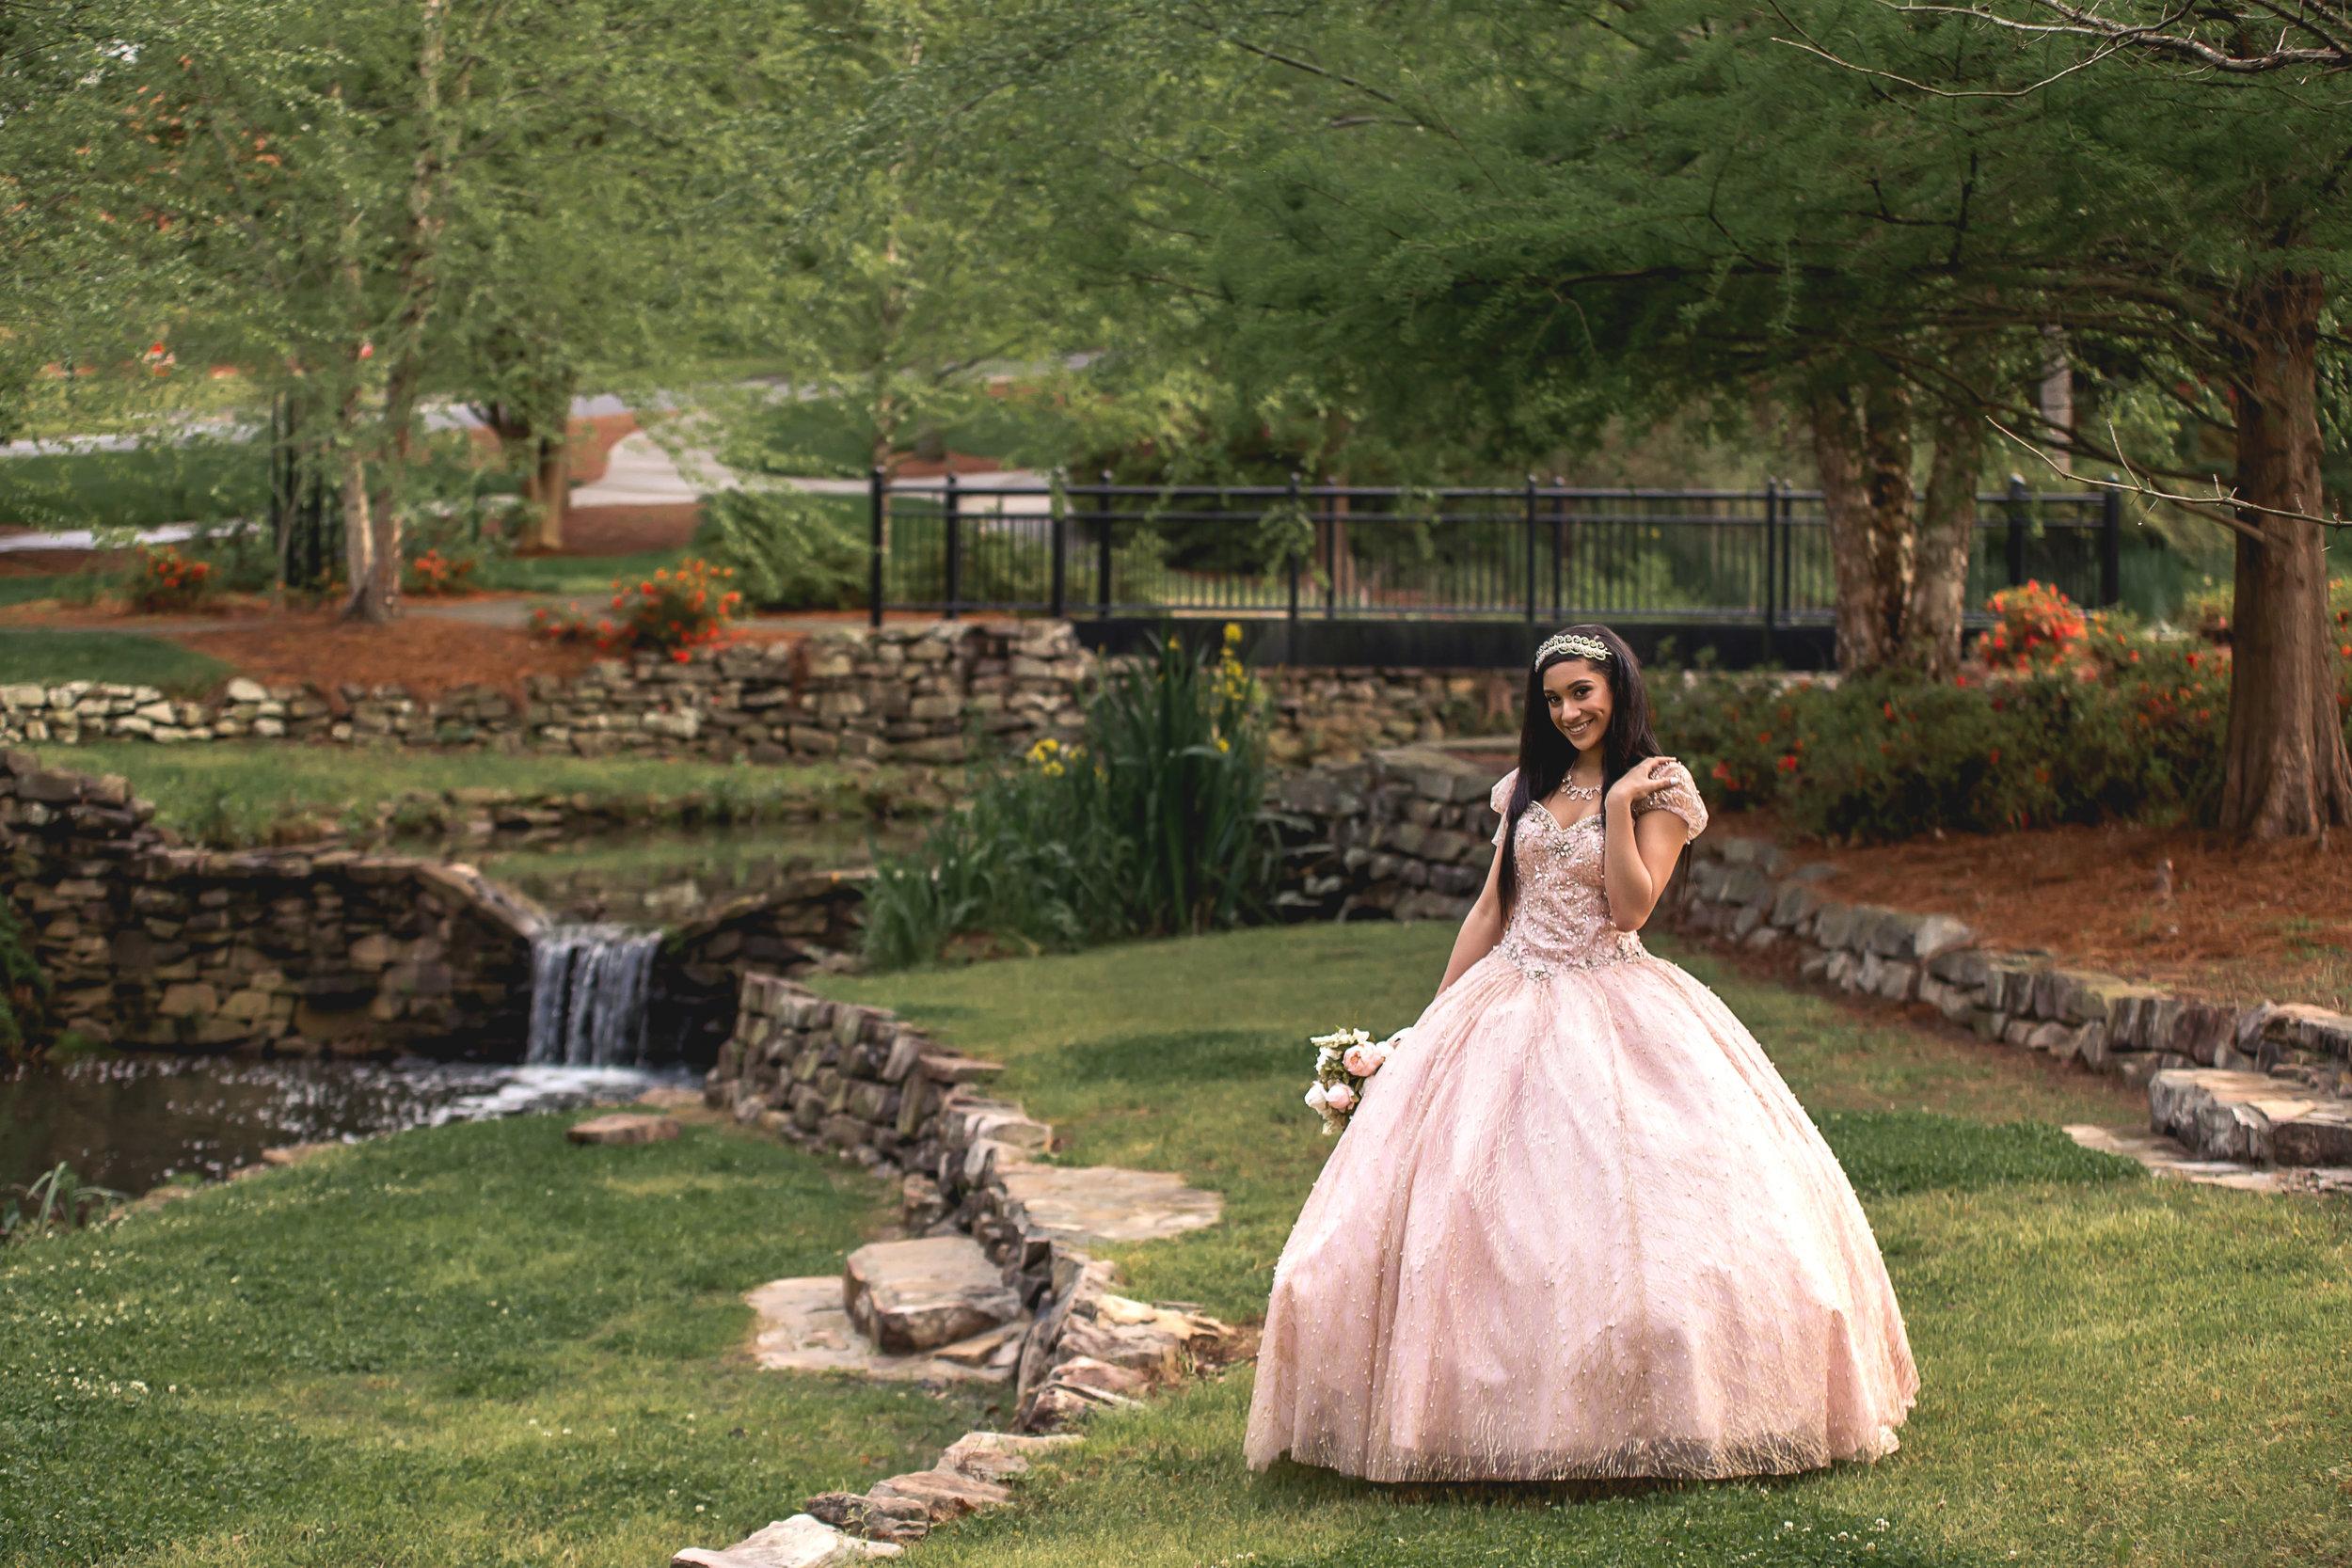 charlotte north carolina portrait photographer quinceanera glencairn gardens rock hill